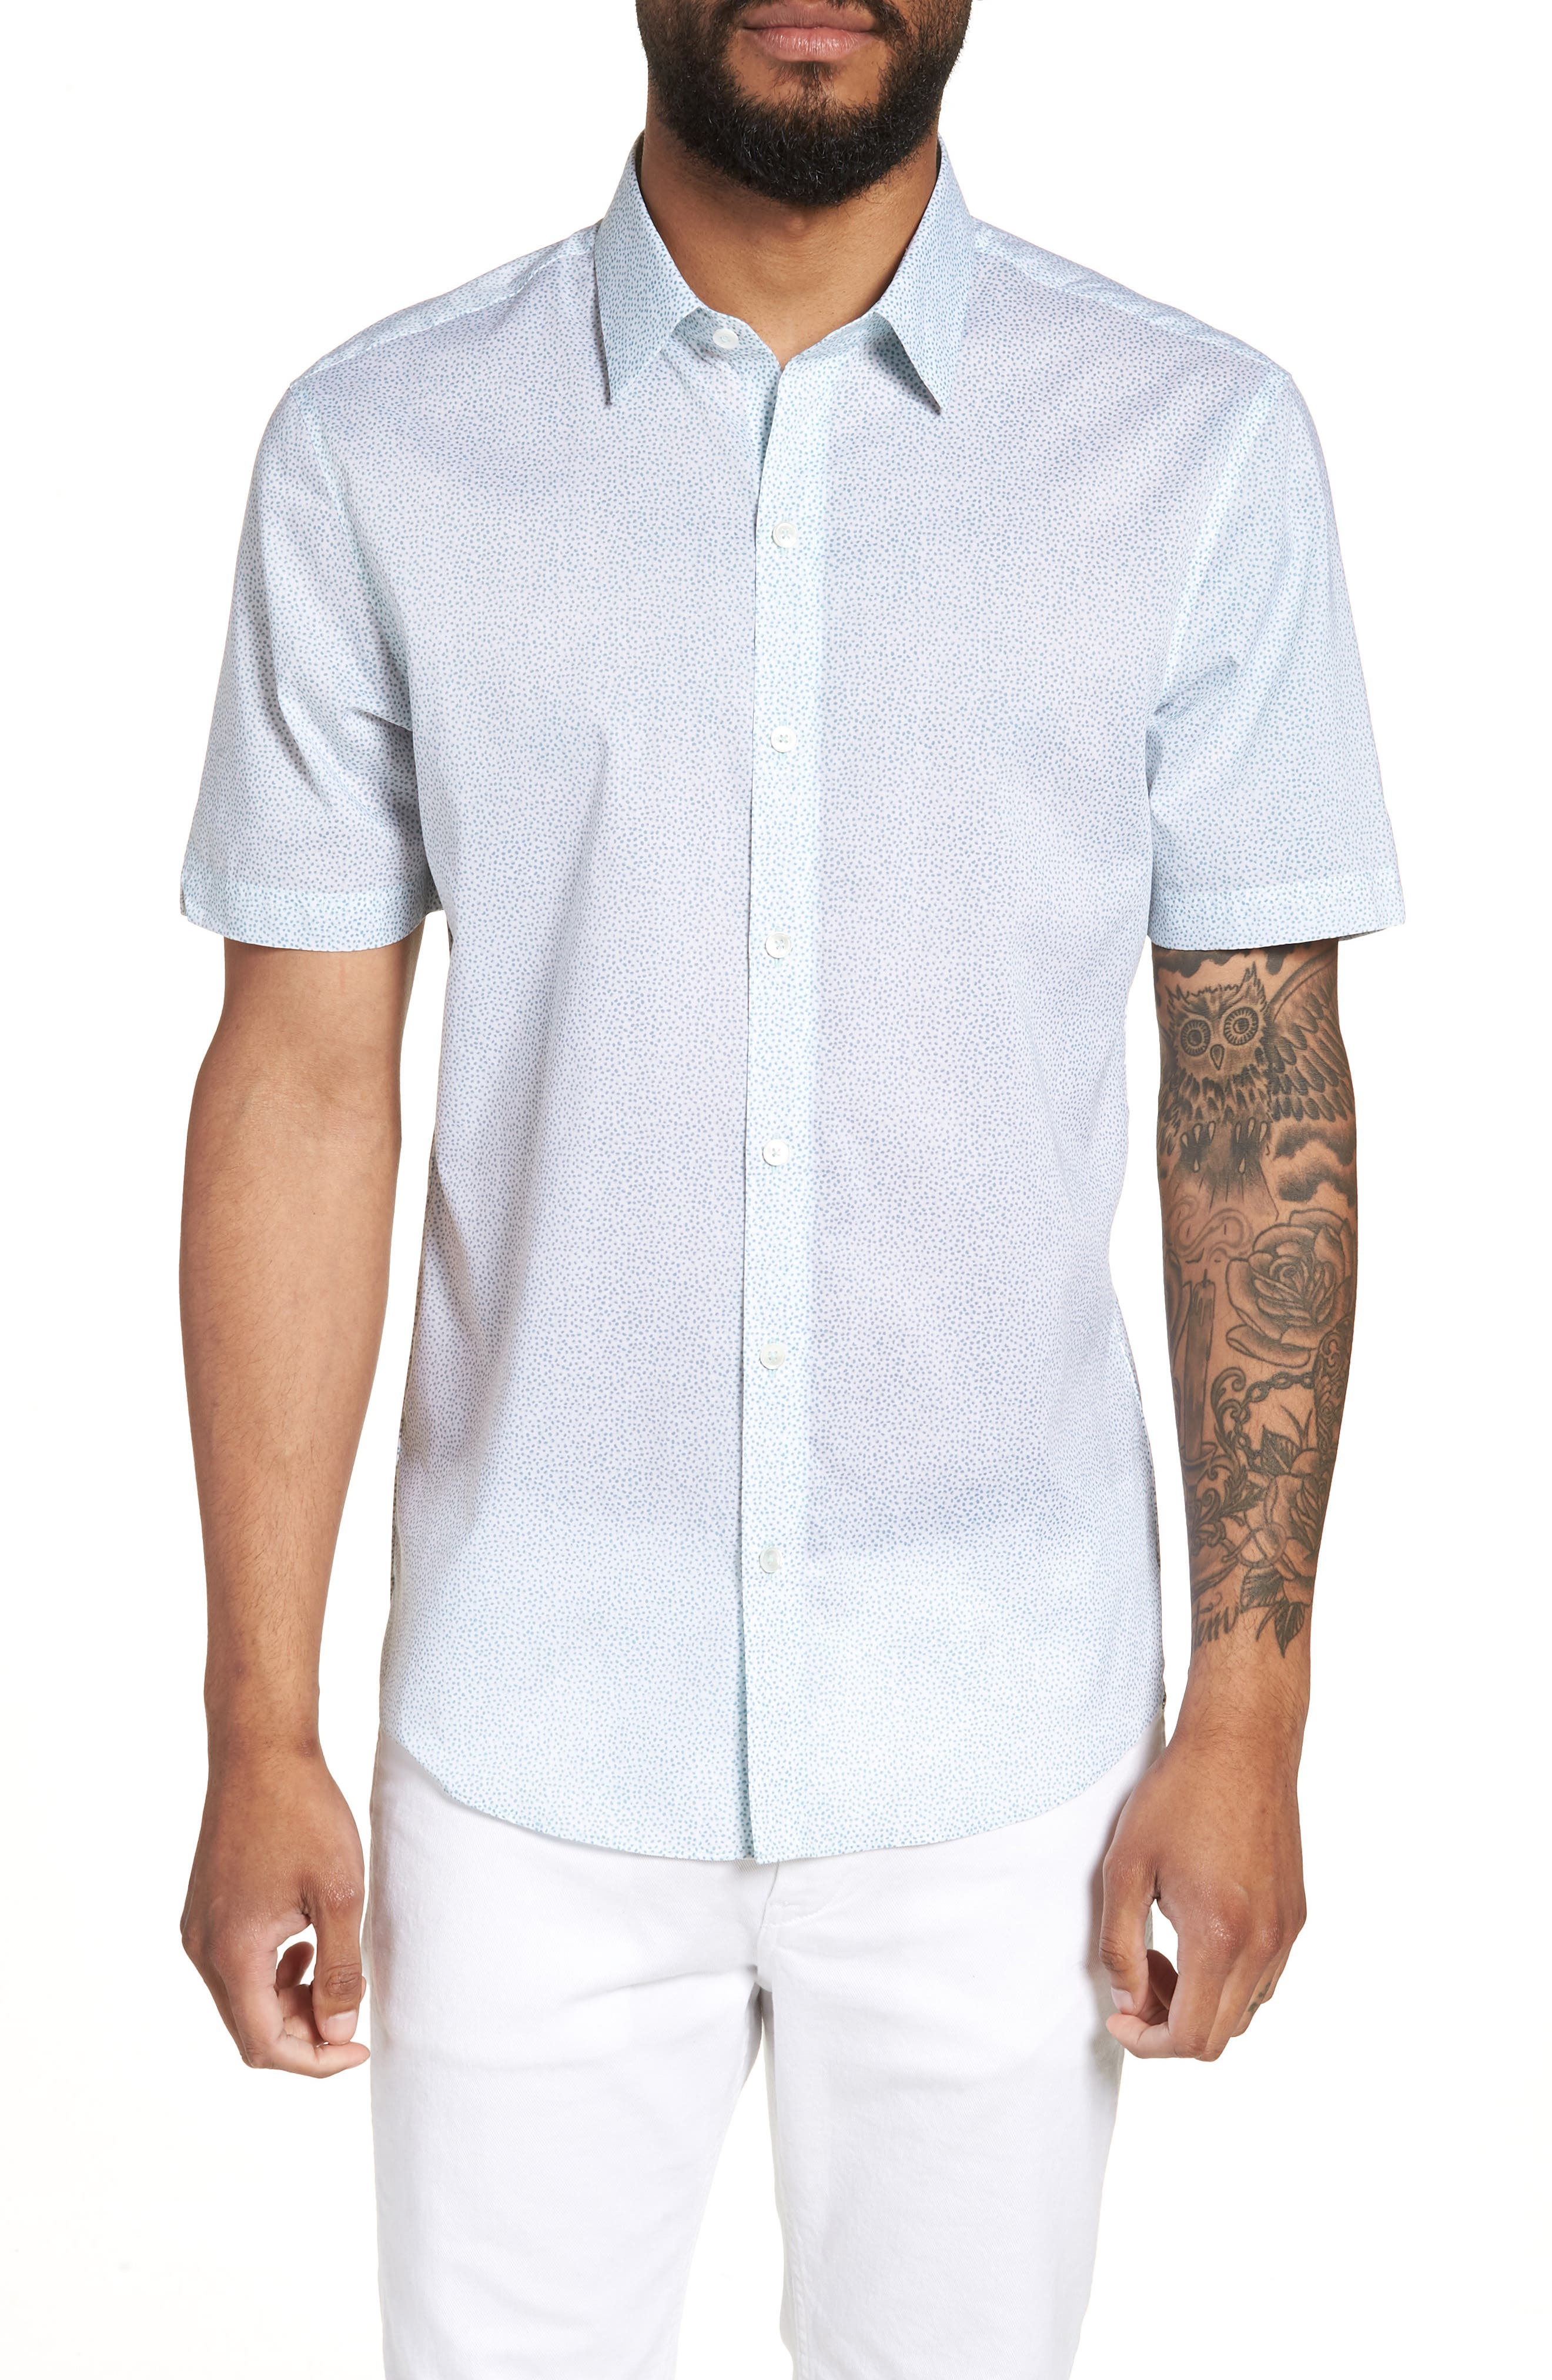 Fung Regular Fit Sport Shirt,                         Main,                         color, WHITE